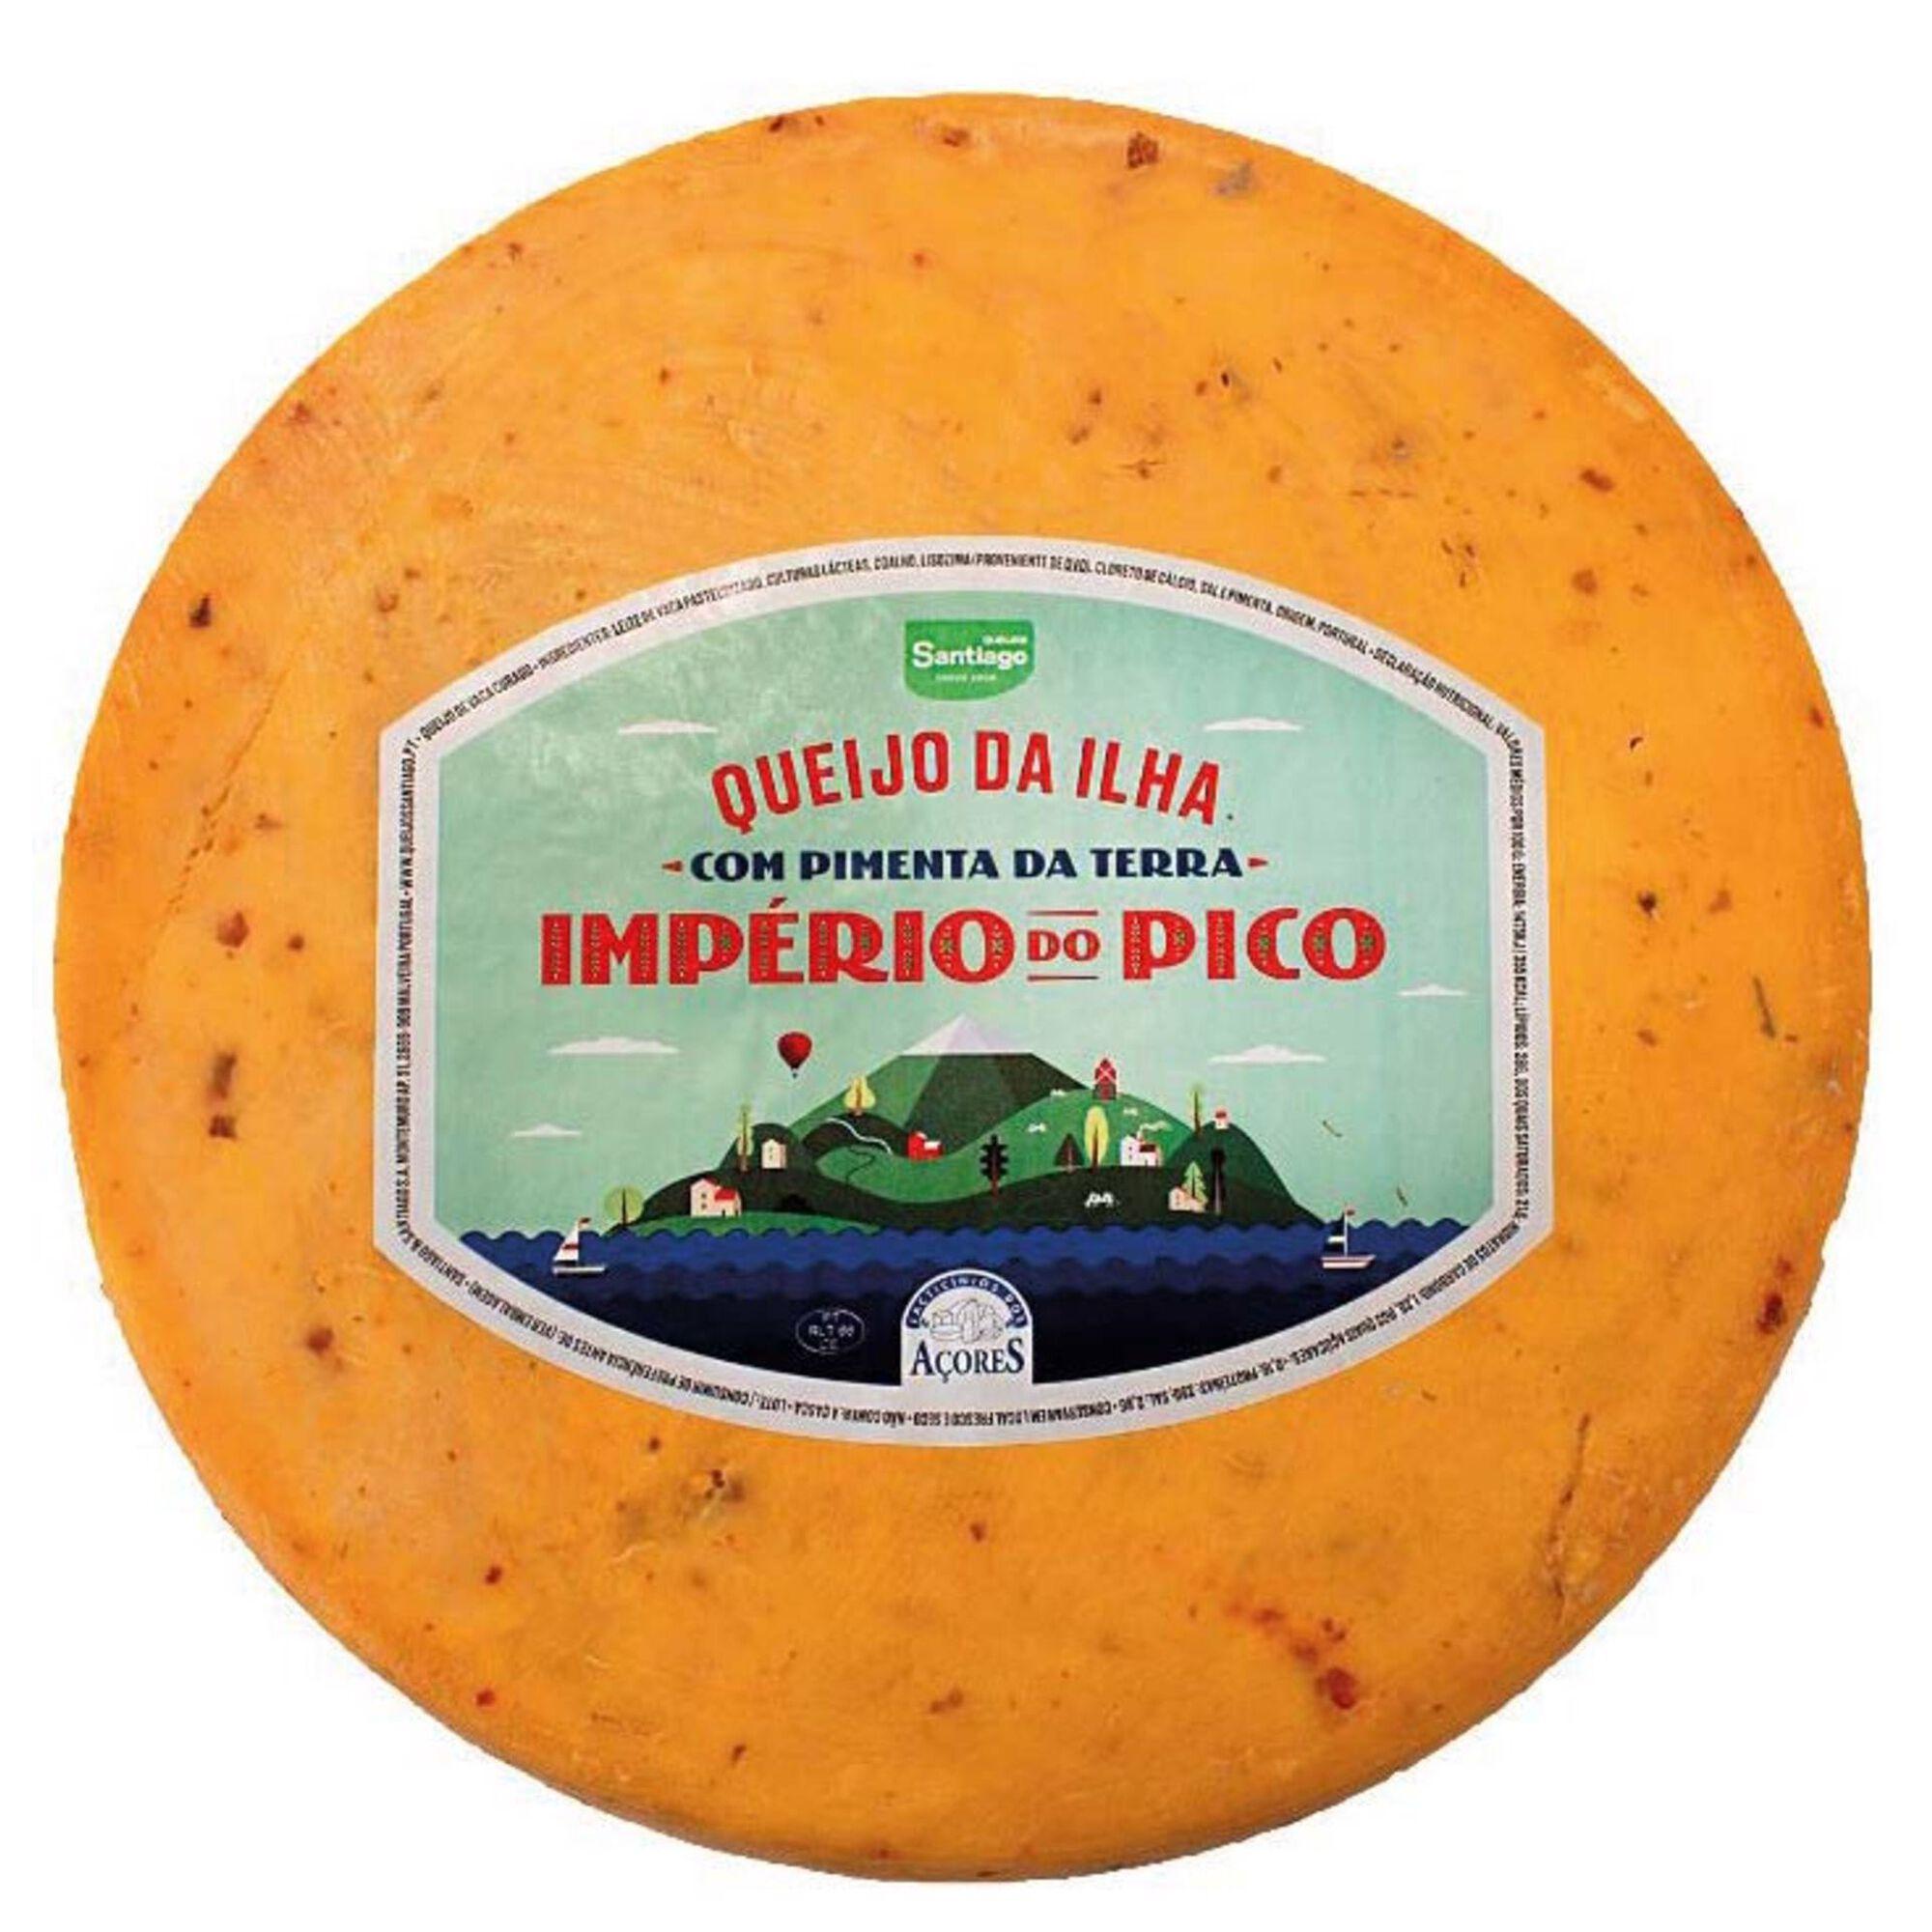 Queijo Ilha Império do Pico Roda